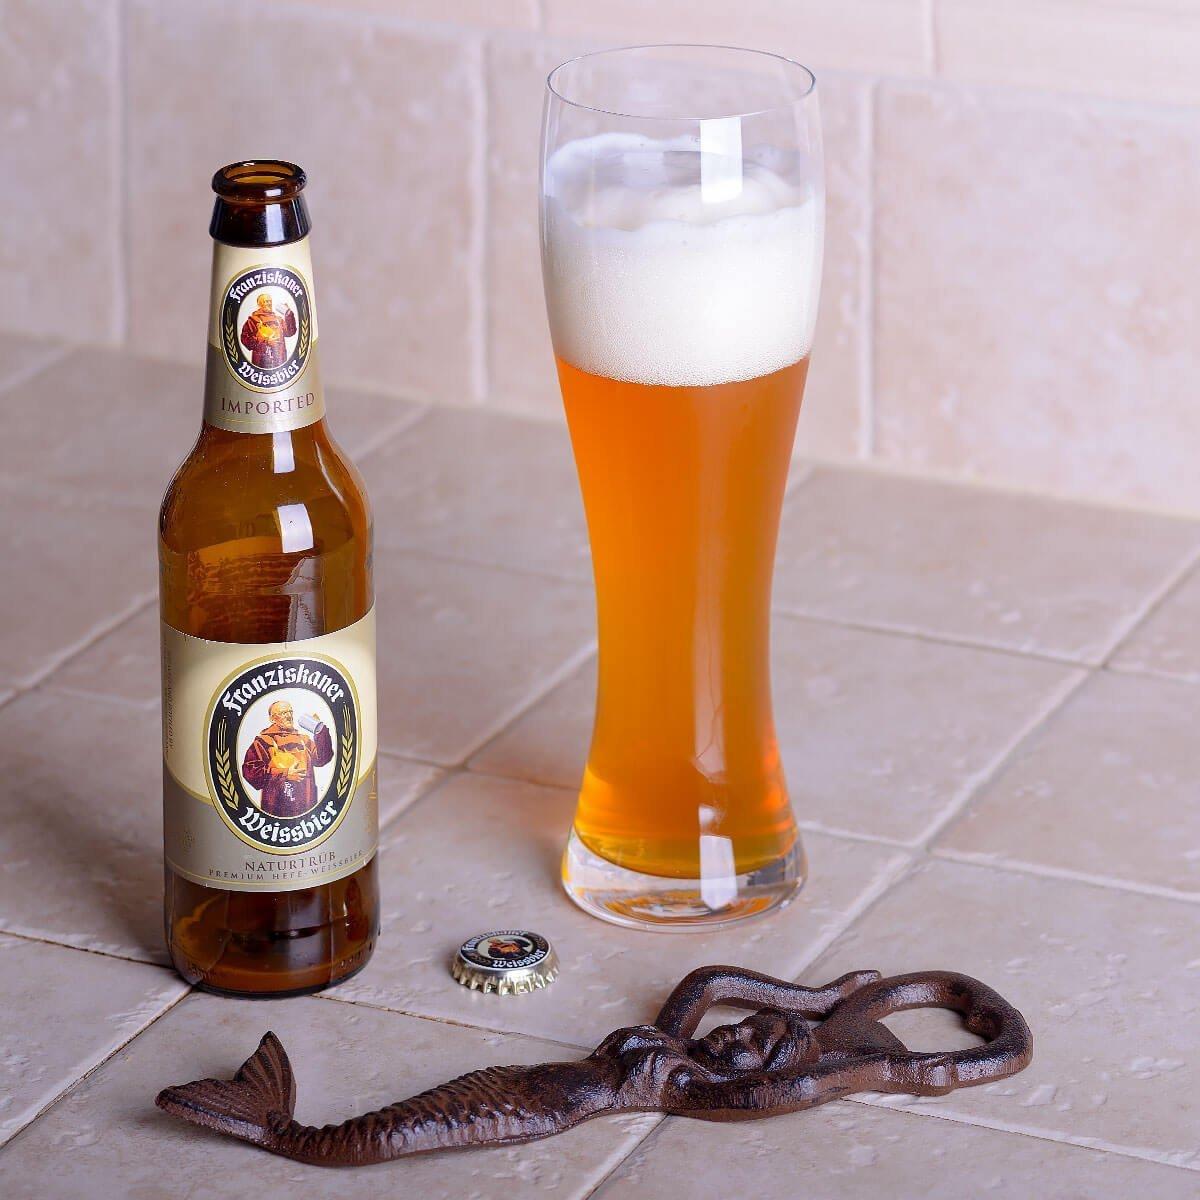 Franziskaner Hefe-Weisse is a Hefeweizen brewed by Spaten-Franziskaner-Bräu that blends tart citrus and clove with banana and doughy bread.